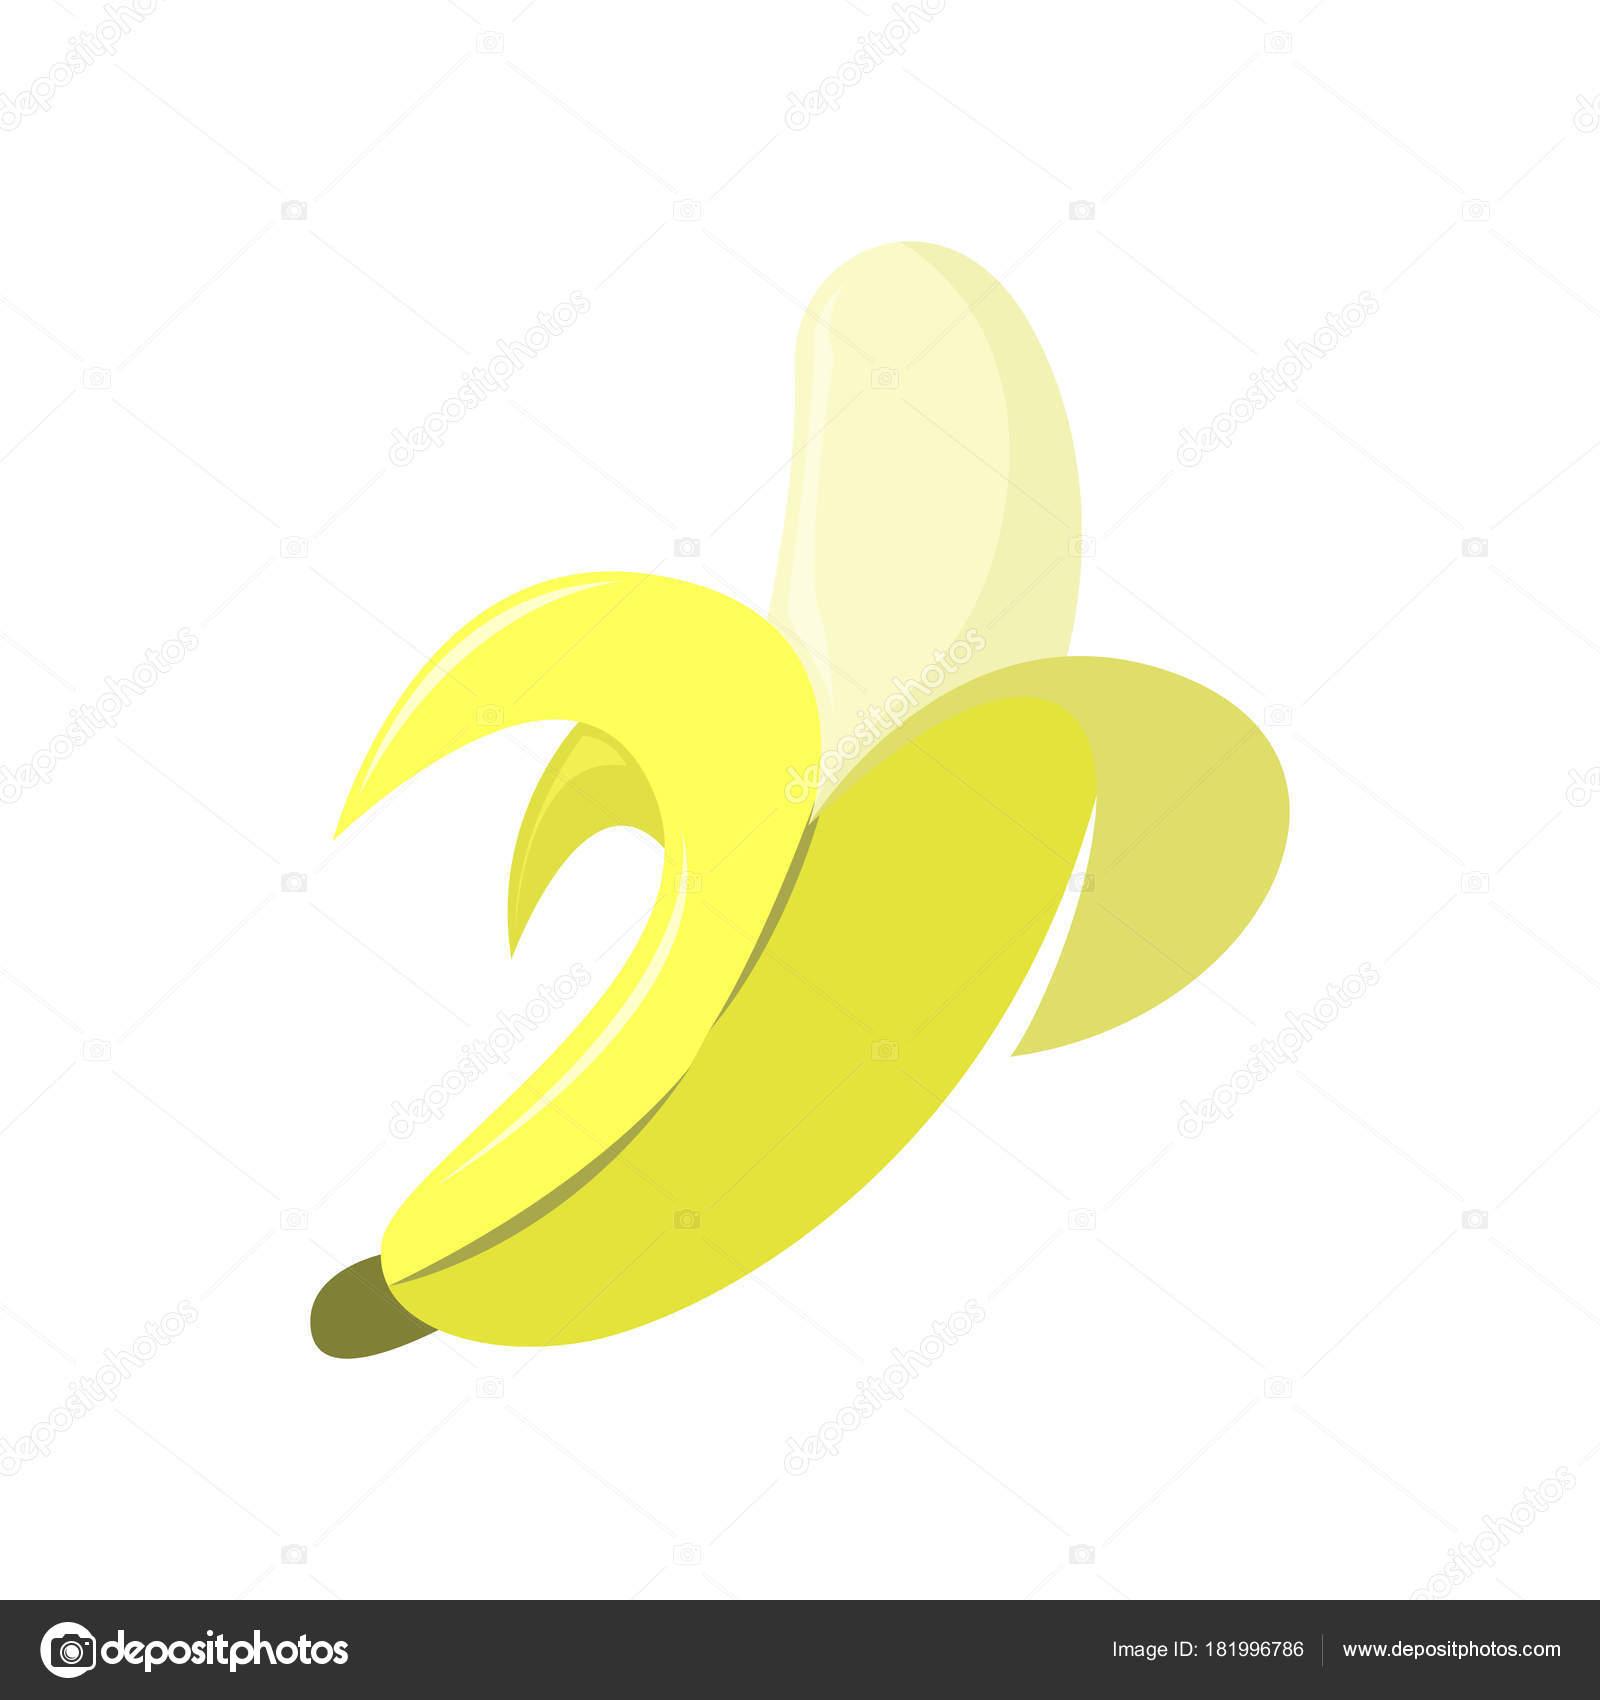 Fresh Banana Peeled Vector Illustration Graphic Design Stock